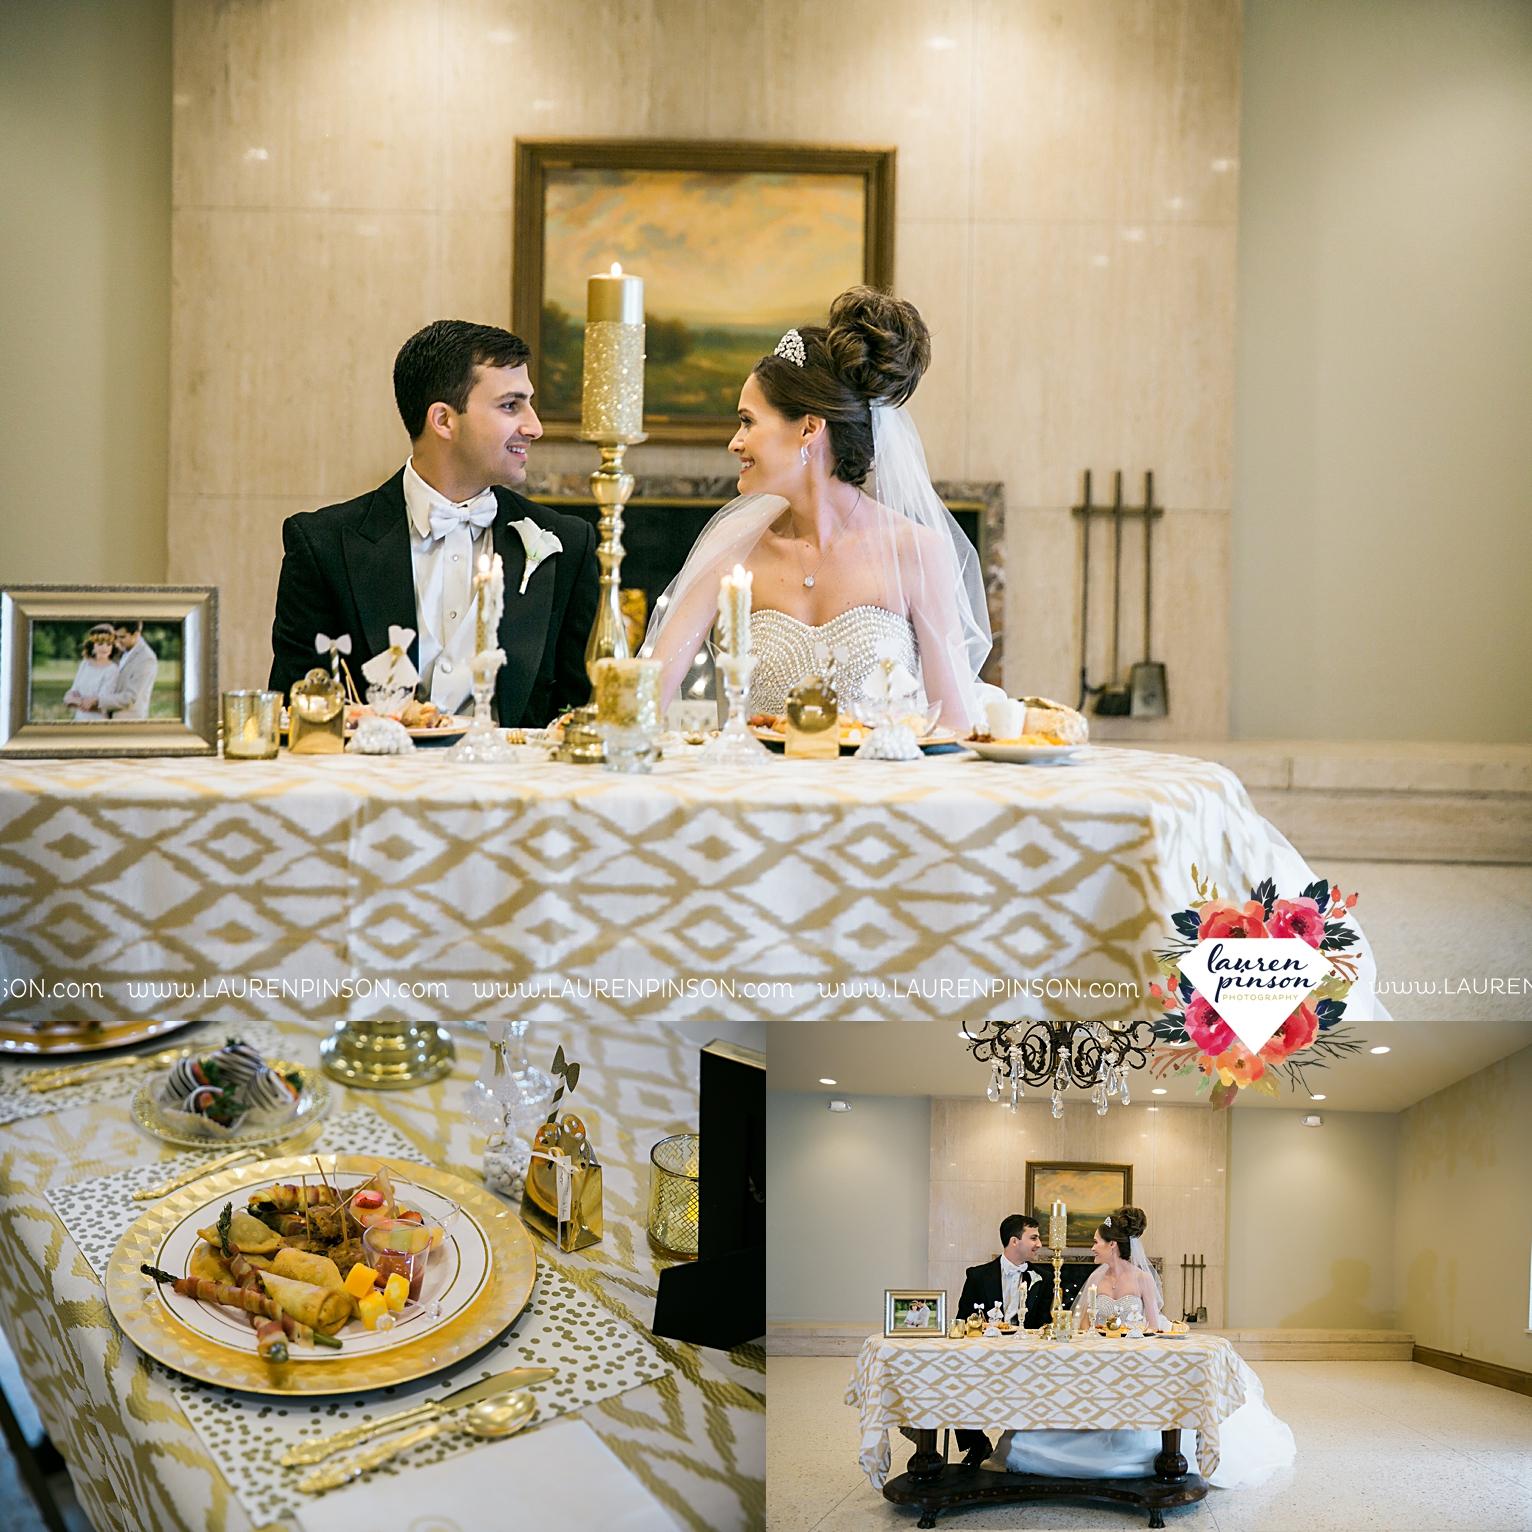 wichita-falls-texas-wedding-photographer-the-forum-by-the-kemp-mayfield-events-ulta-gold-glitter_2874.jpg